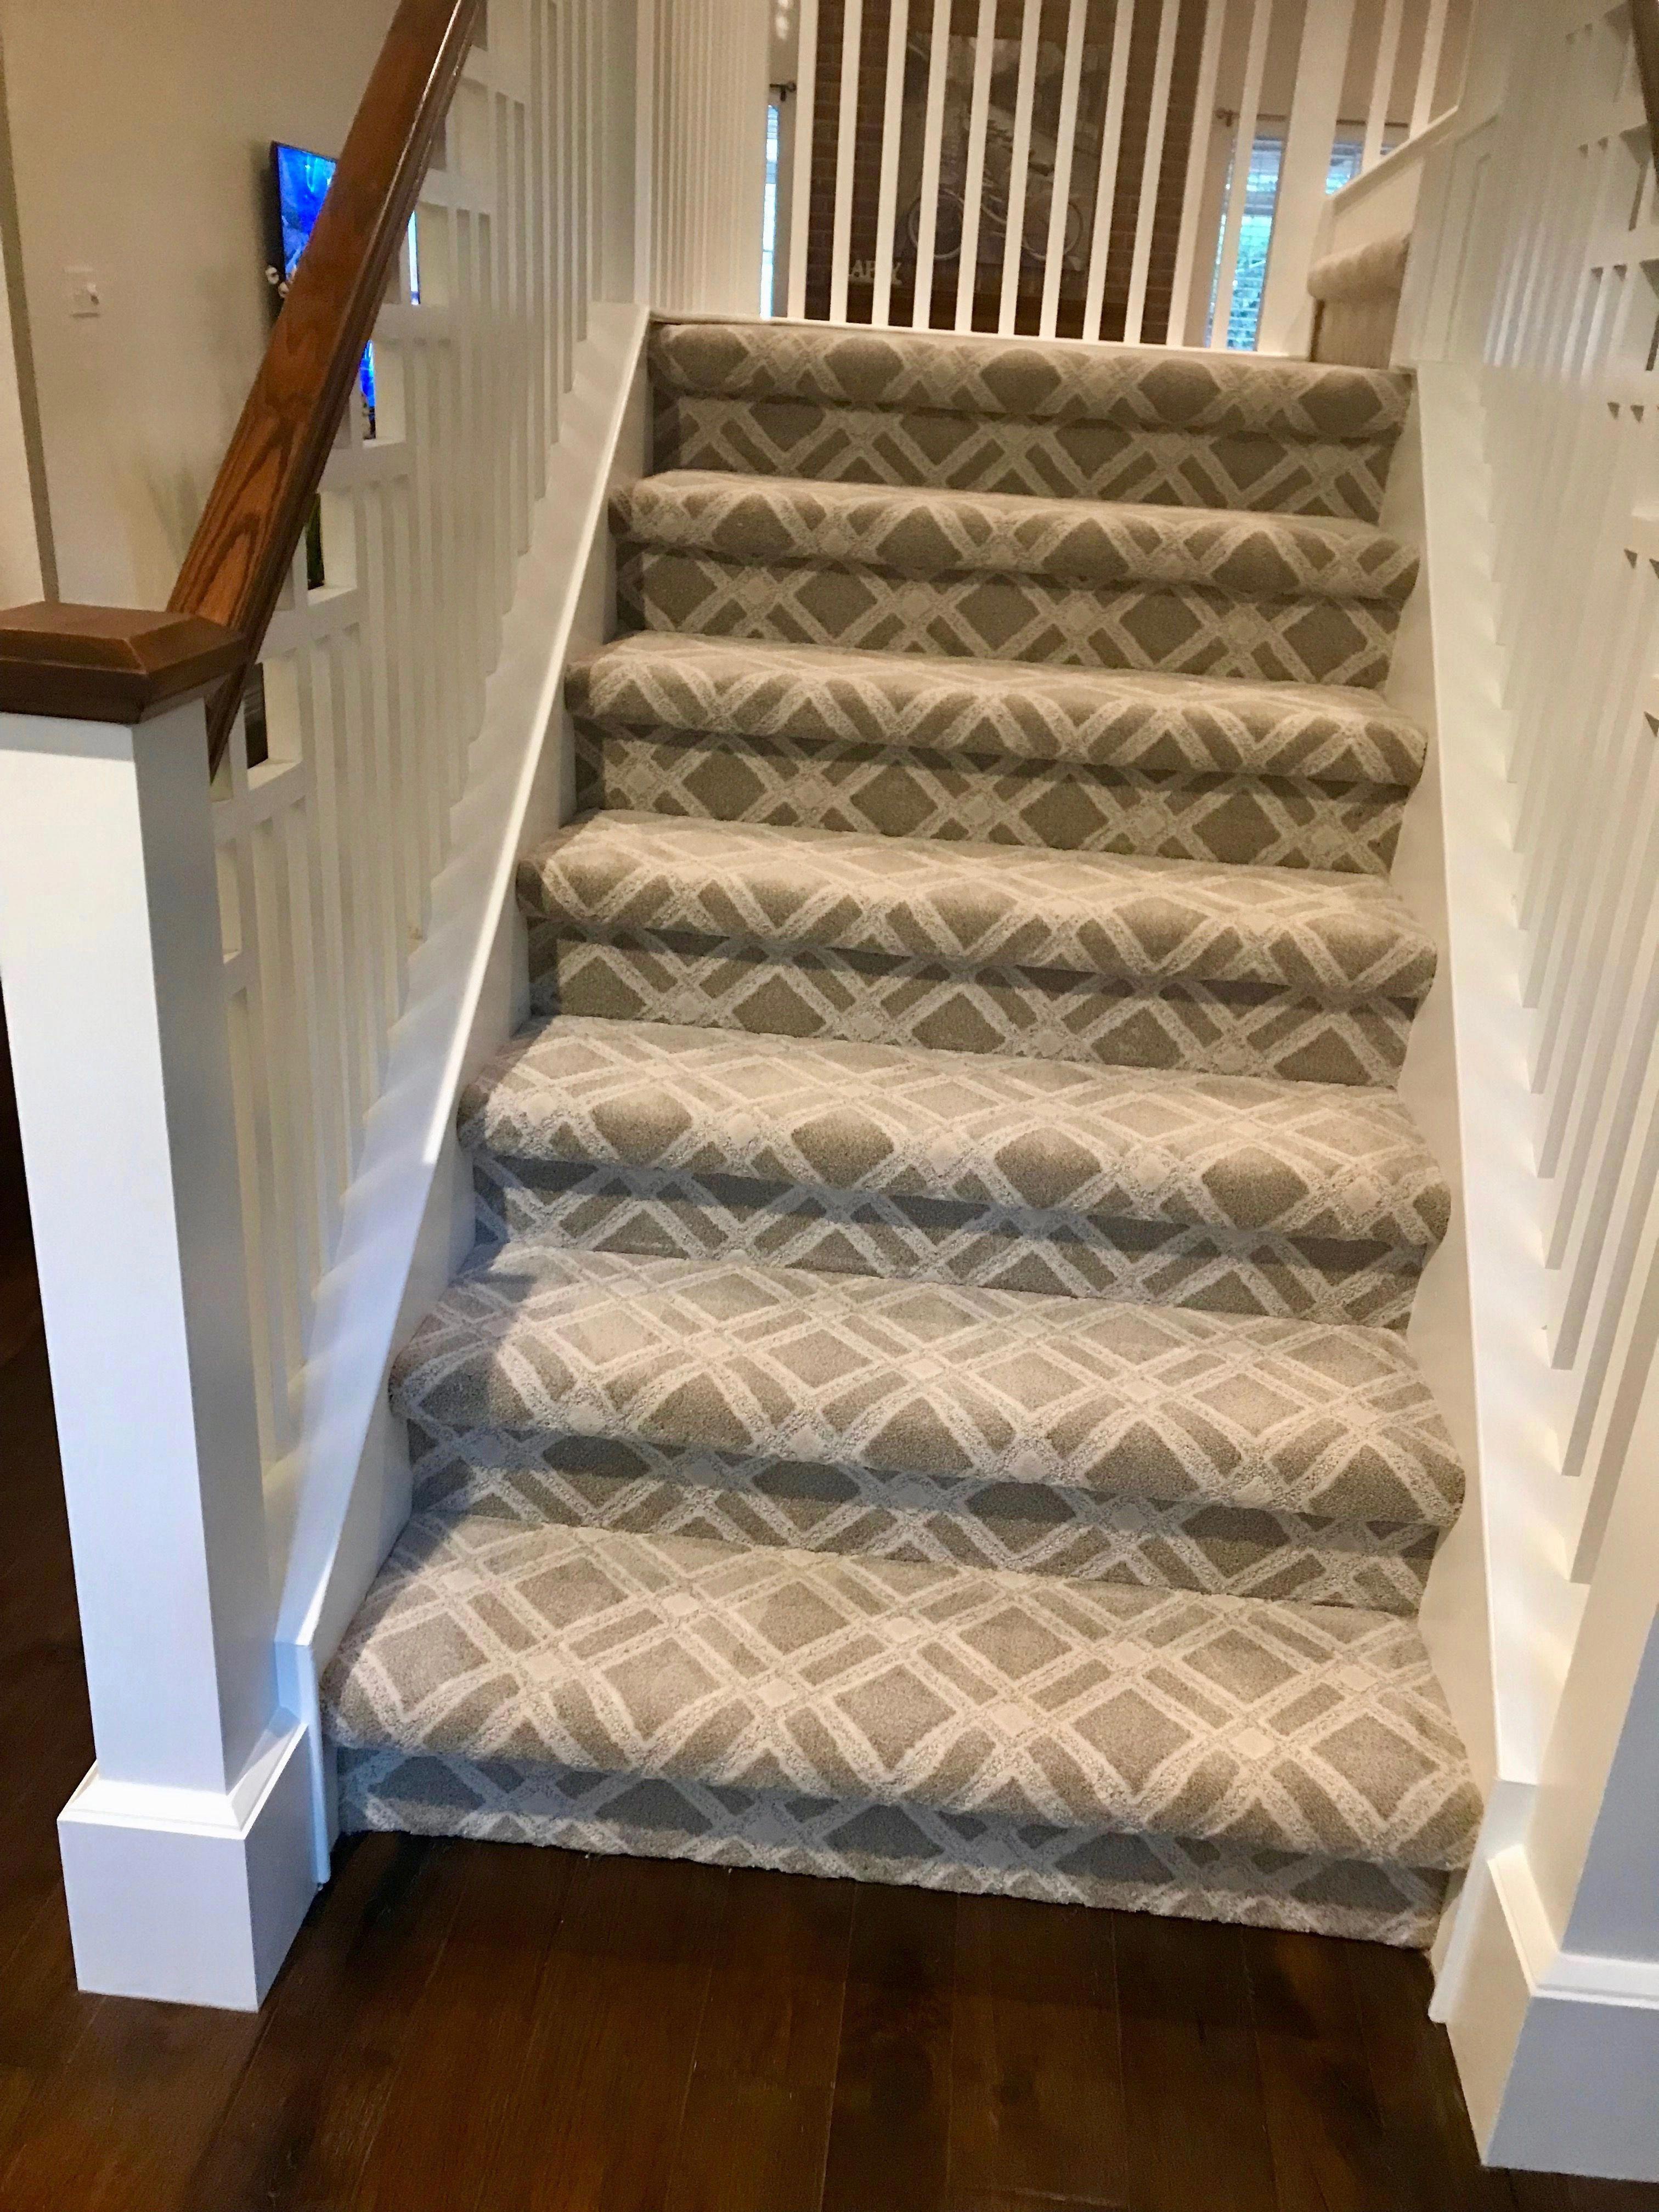 Where To Buy Plastic Carpet Runners Key 1934847238 Carpet